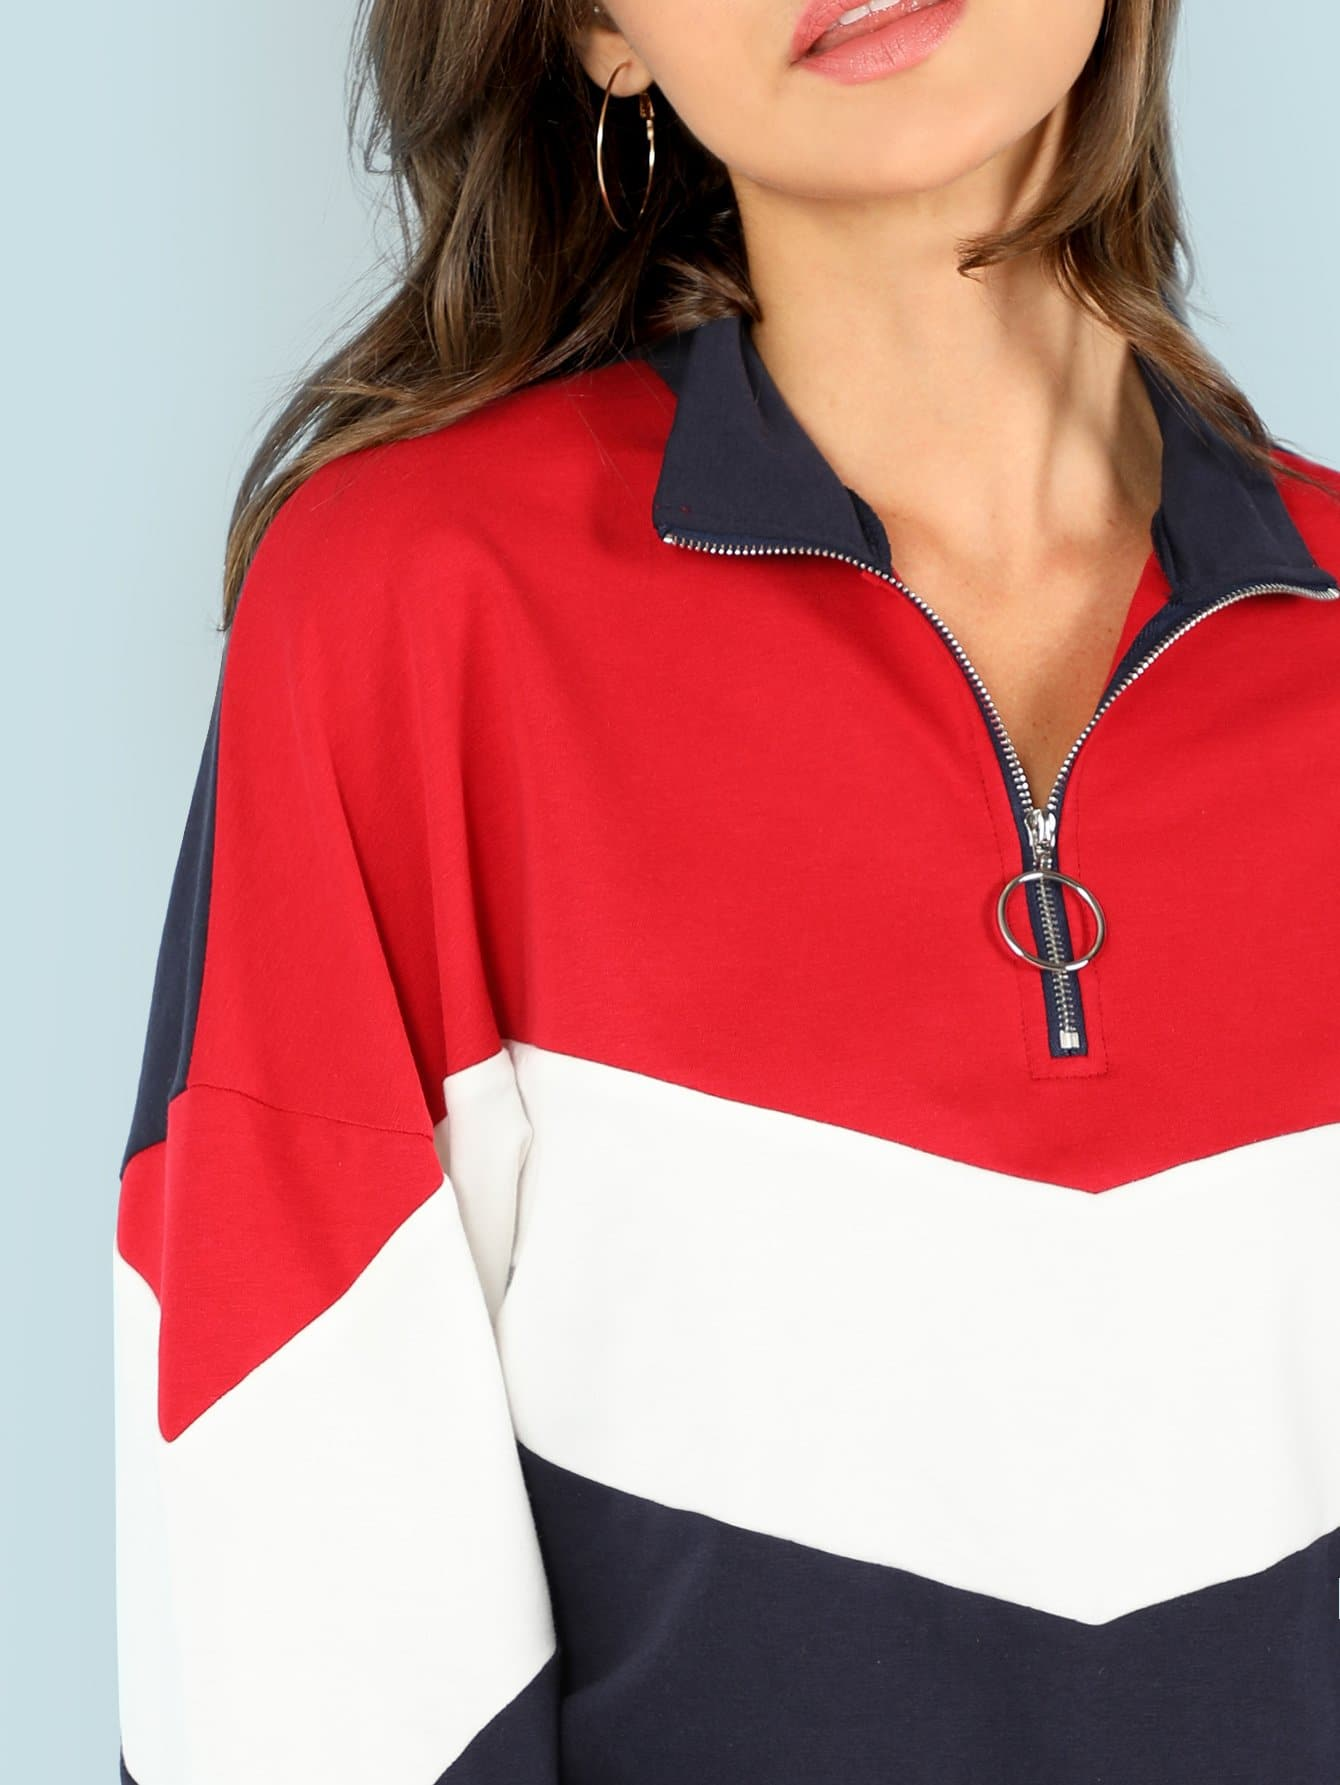 0e25f55d314 O-Ring Zip Front Cut and Sew Sweatshirt